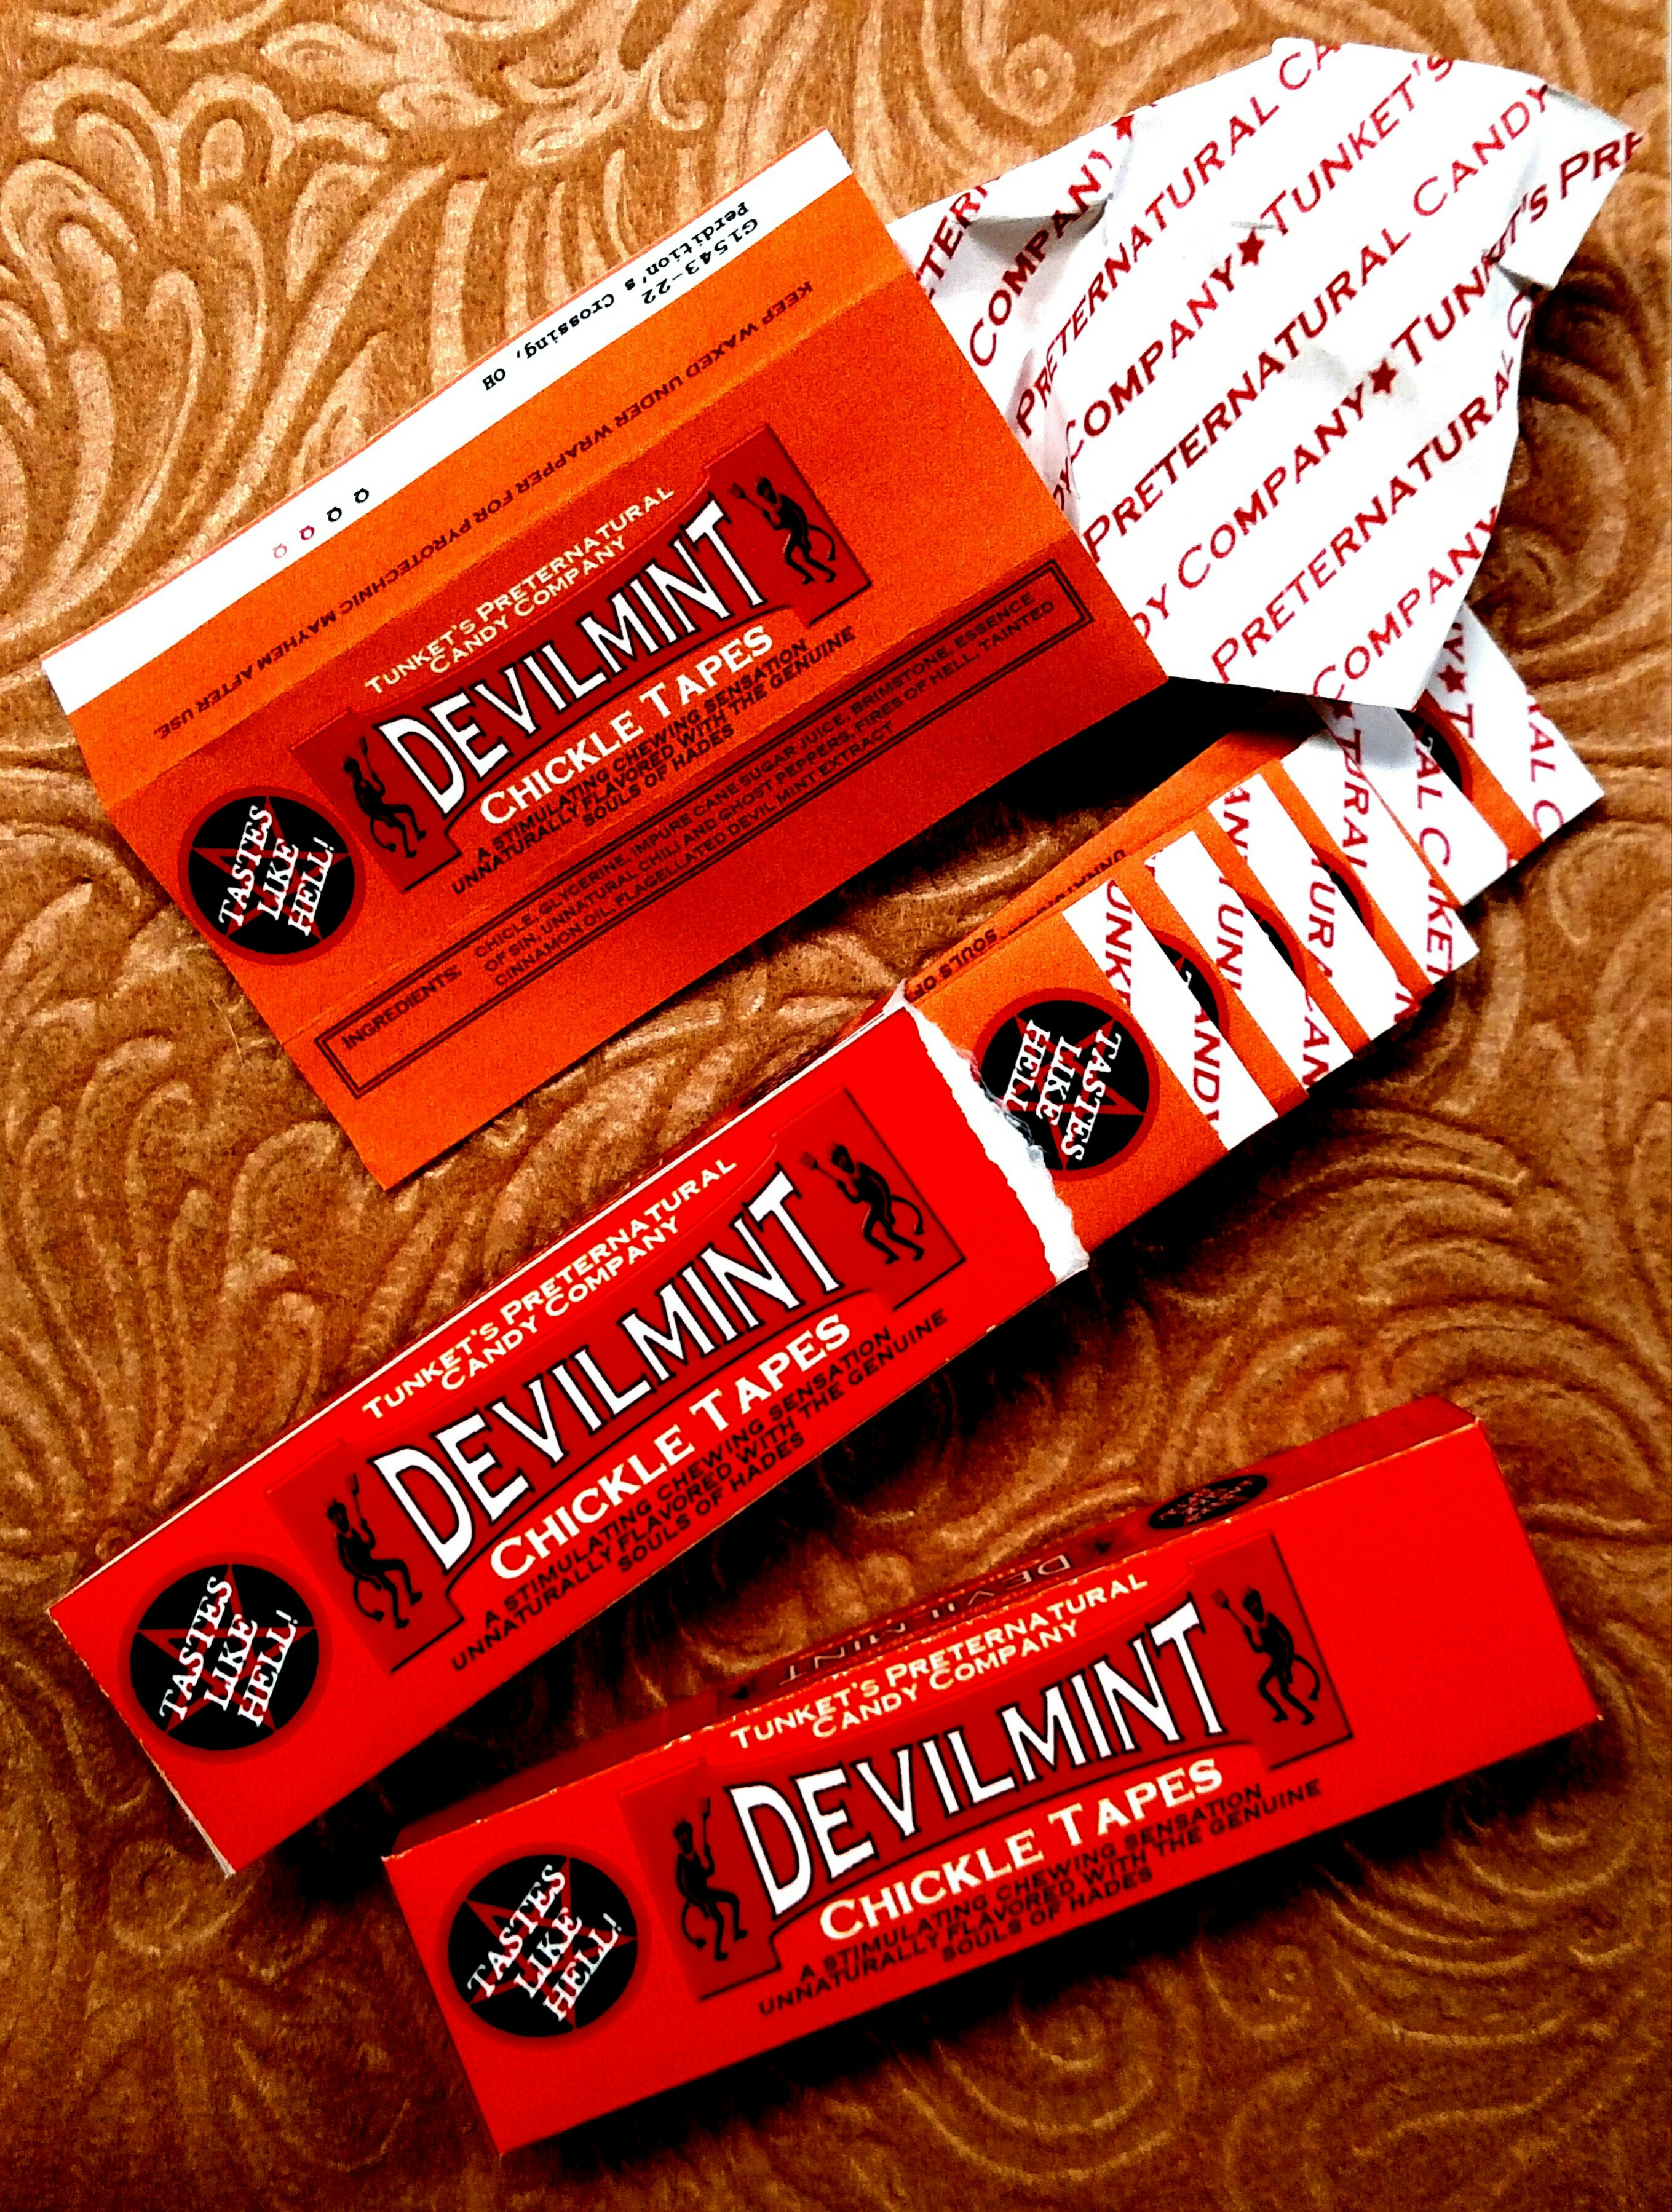 Devilmint